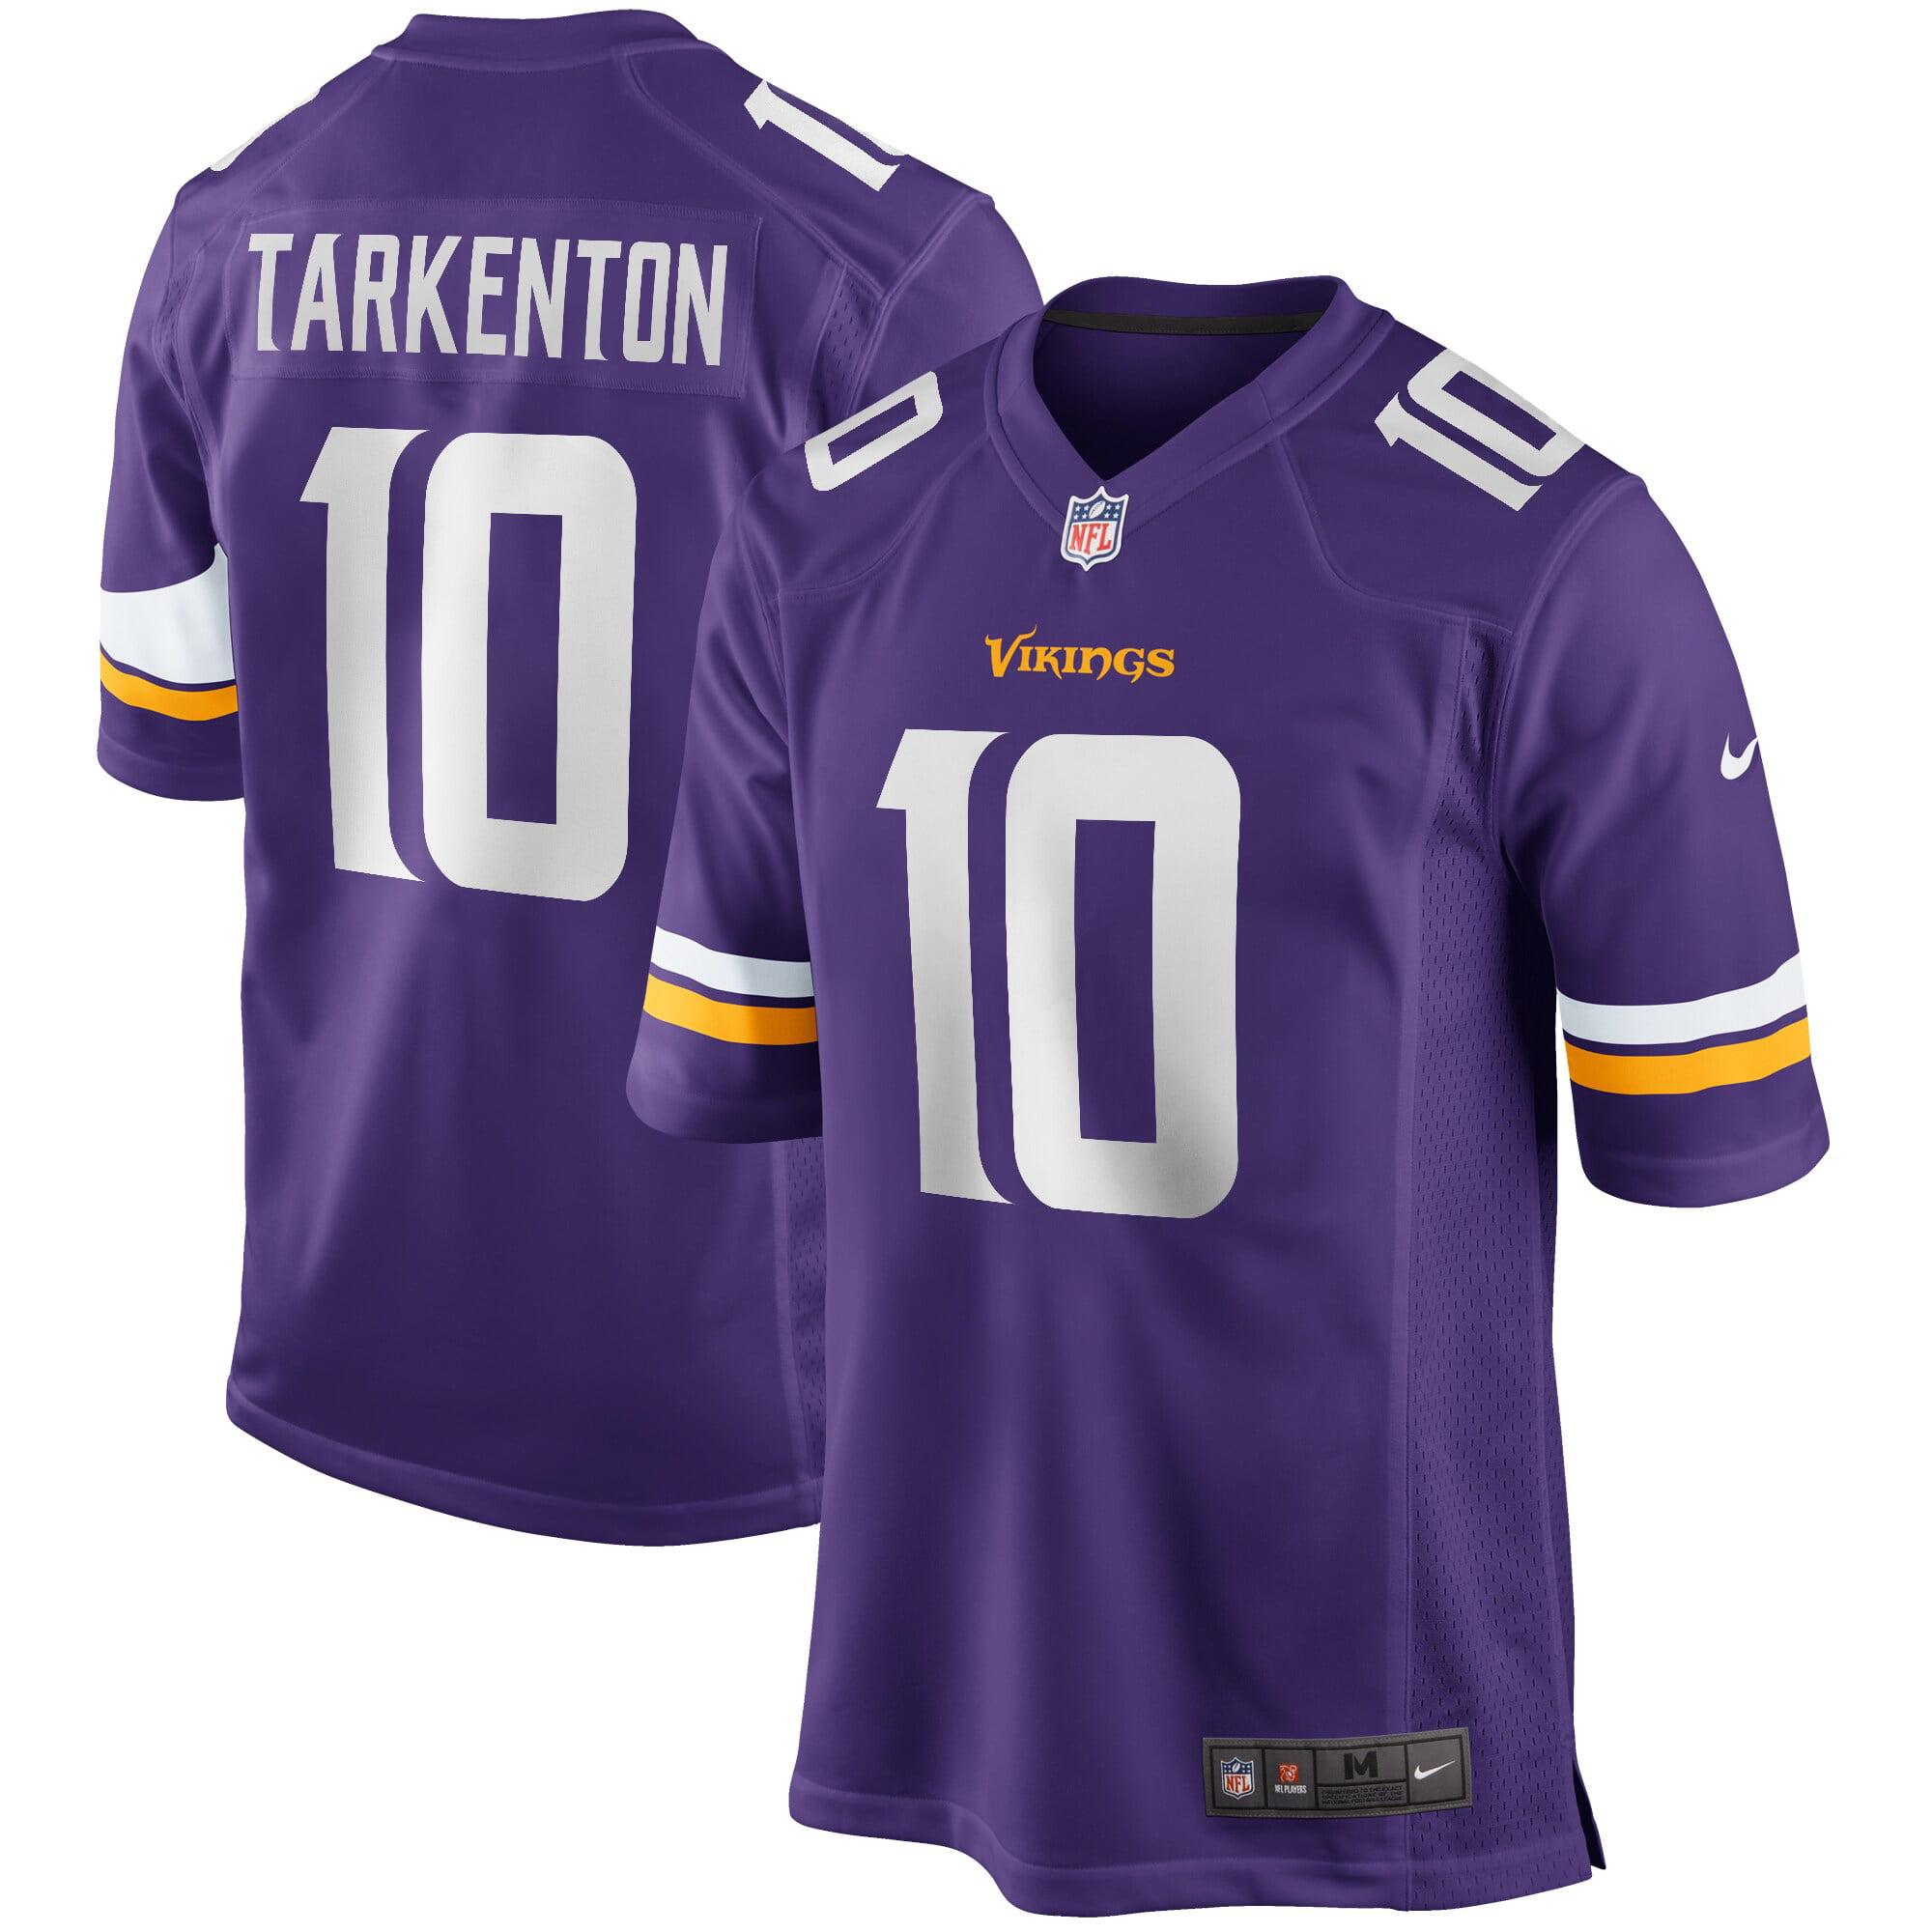 Fran Tarkenton Minnesota Vikings Nike Game Retired Player Jersey - Purple - Walmart.com